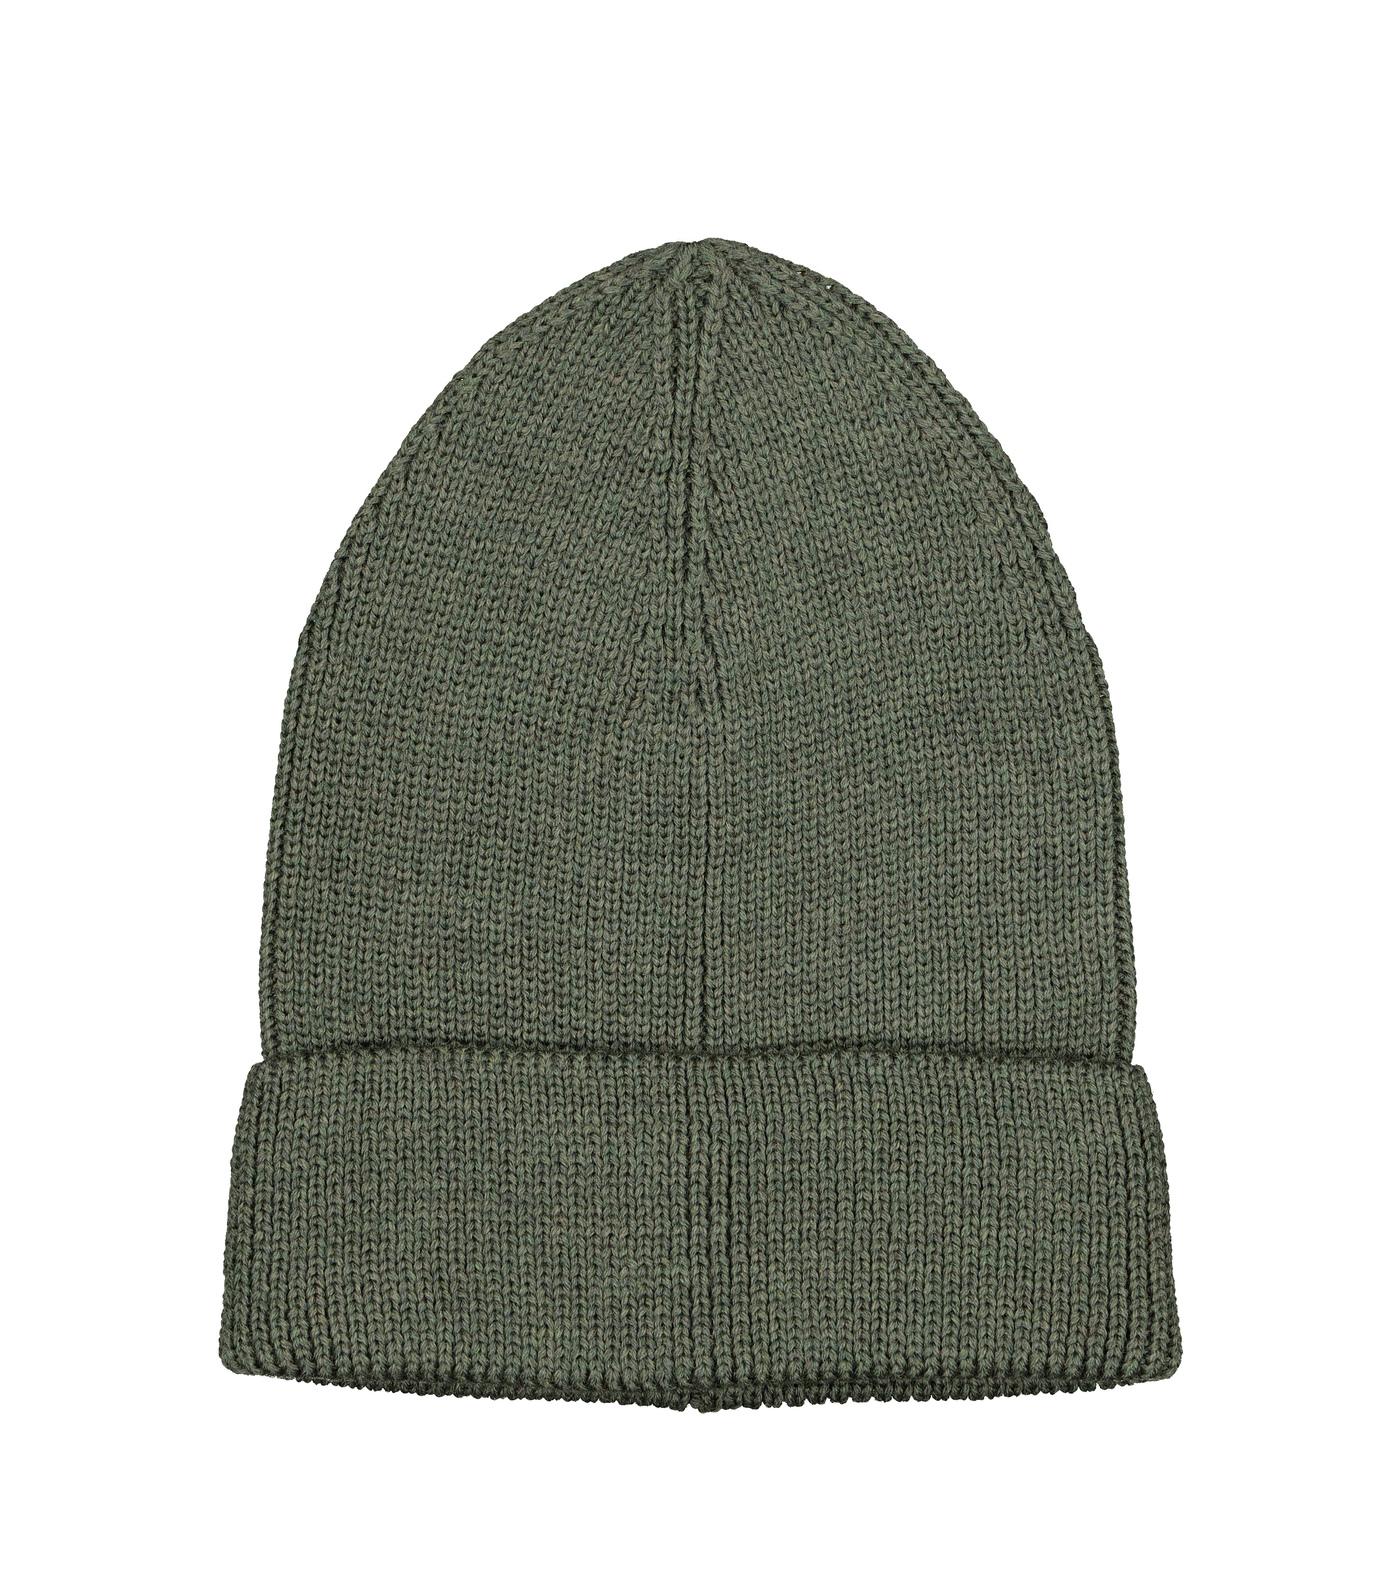 HAT ETOILE - Khaki